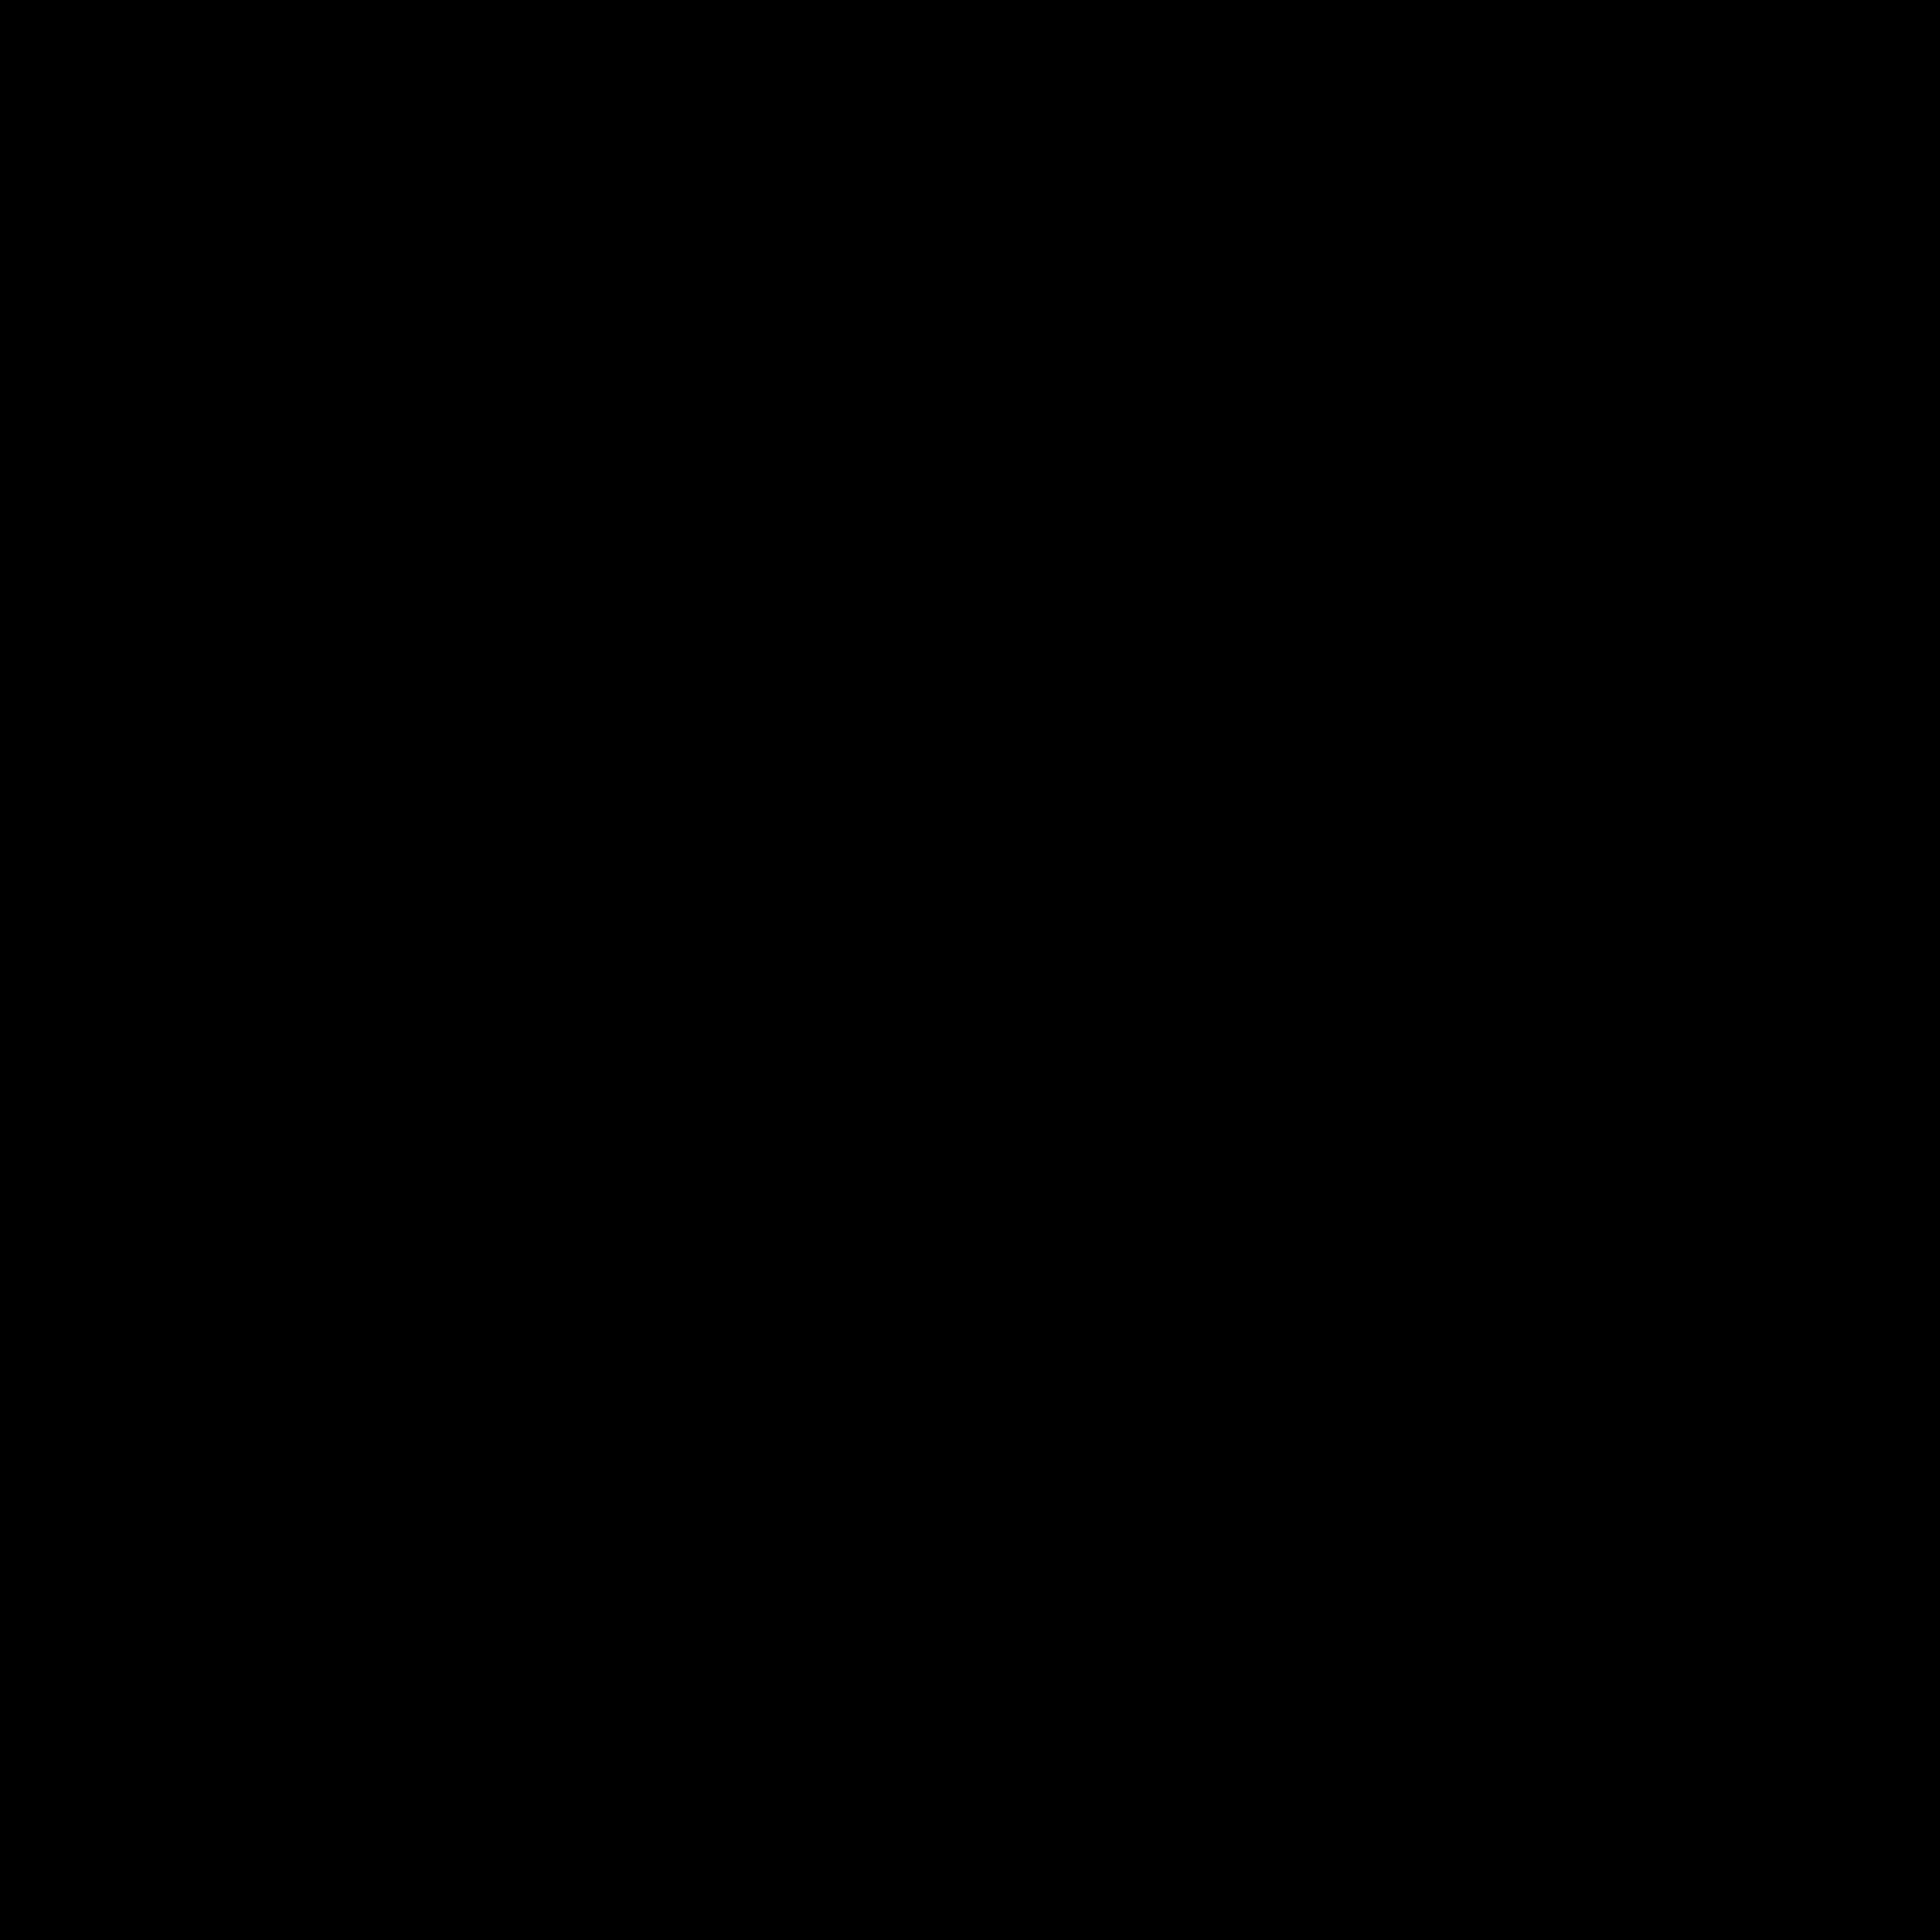 hennessy-logo-png-transparent.png